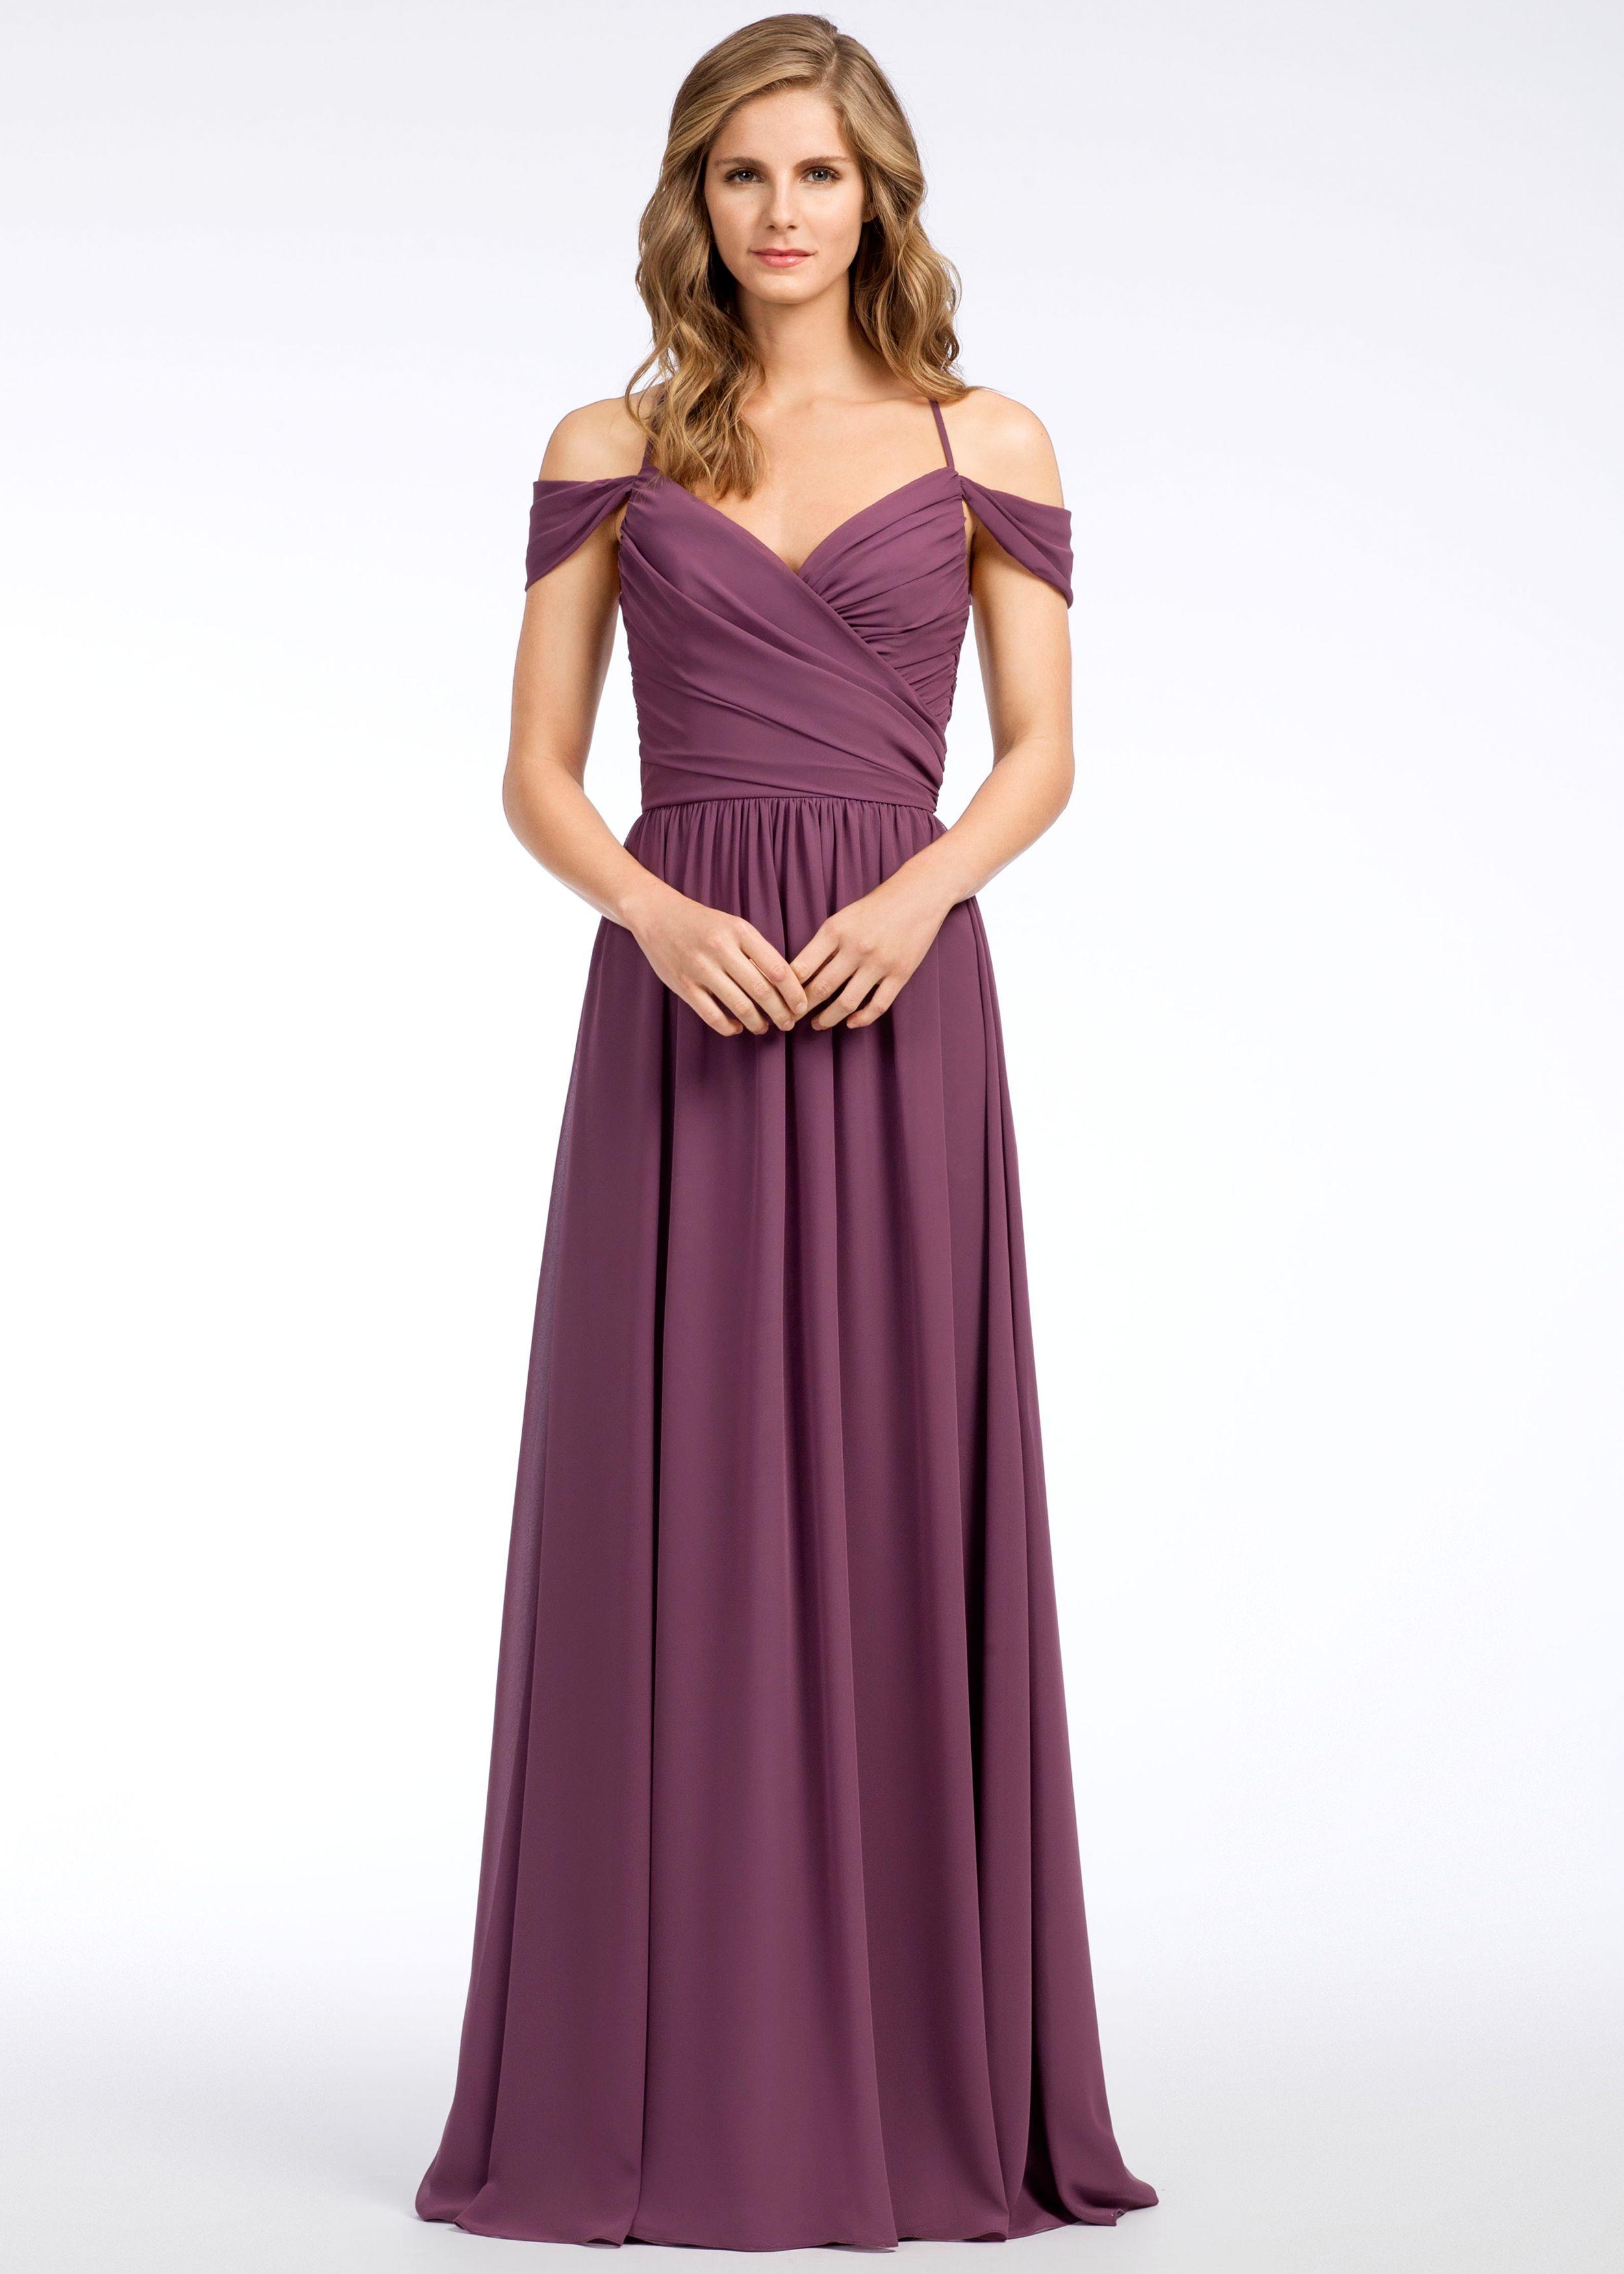 Comfortable Prom Dresses Memphis Pictures Inspiration - Wedding ...